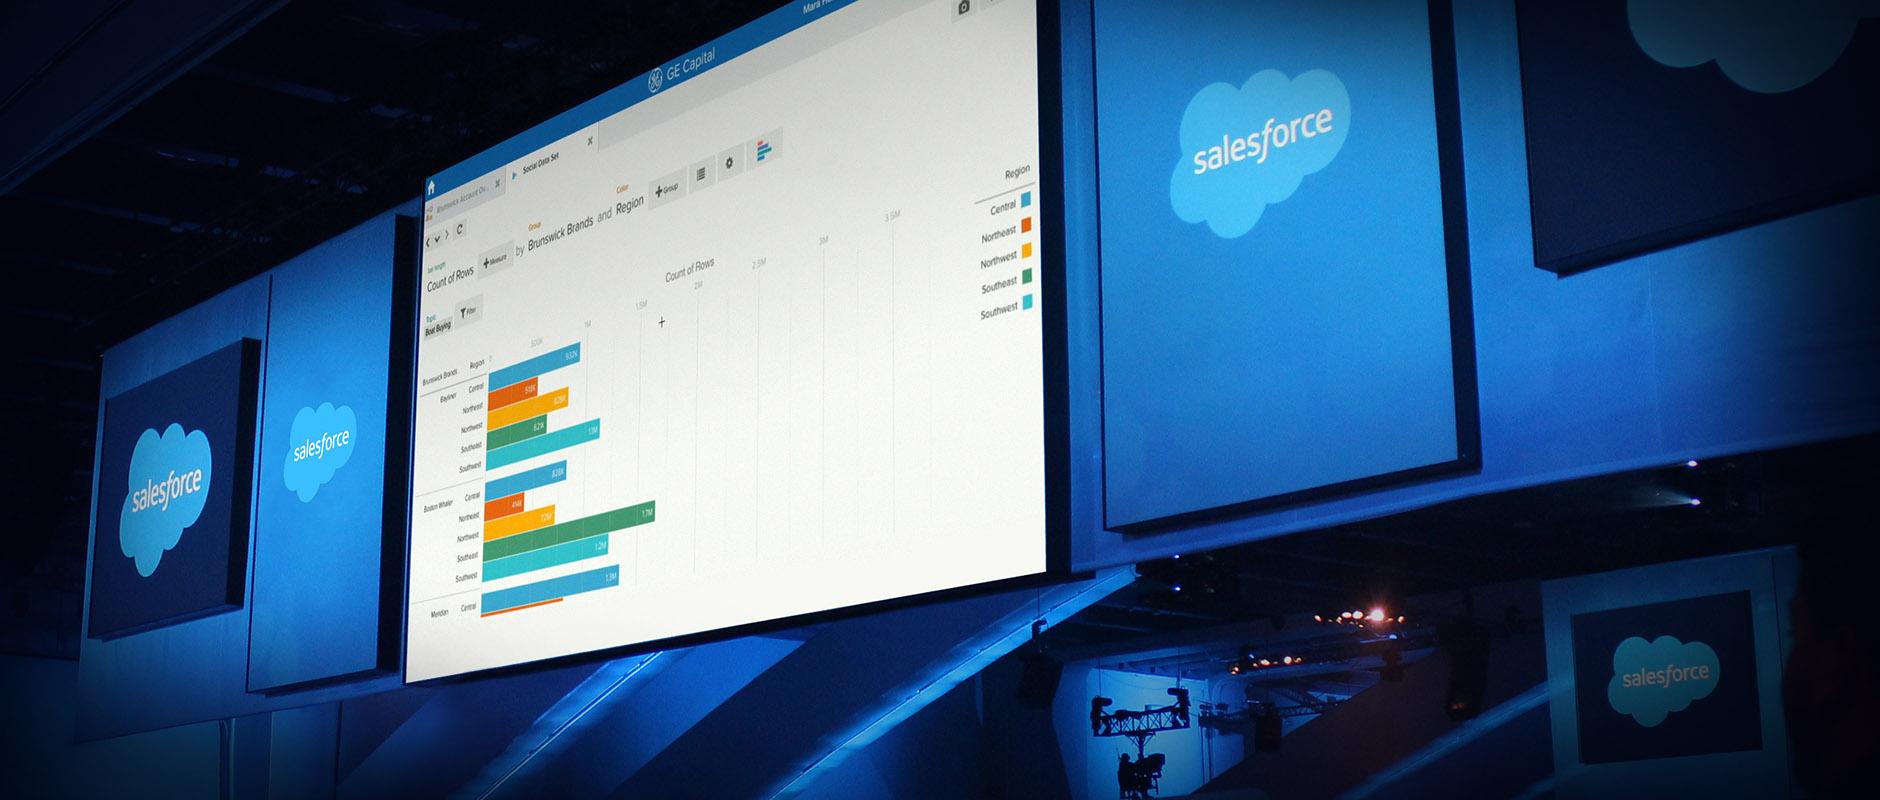 salesforce-hero-large.jpg